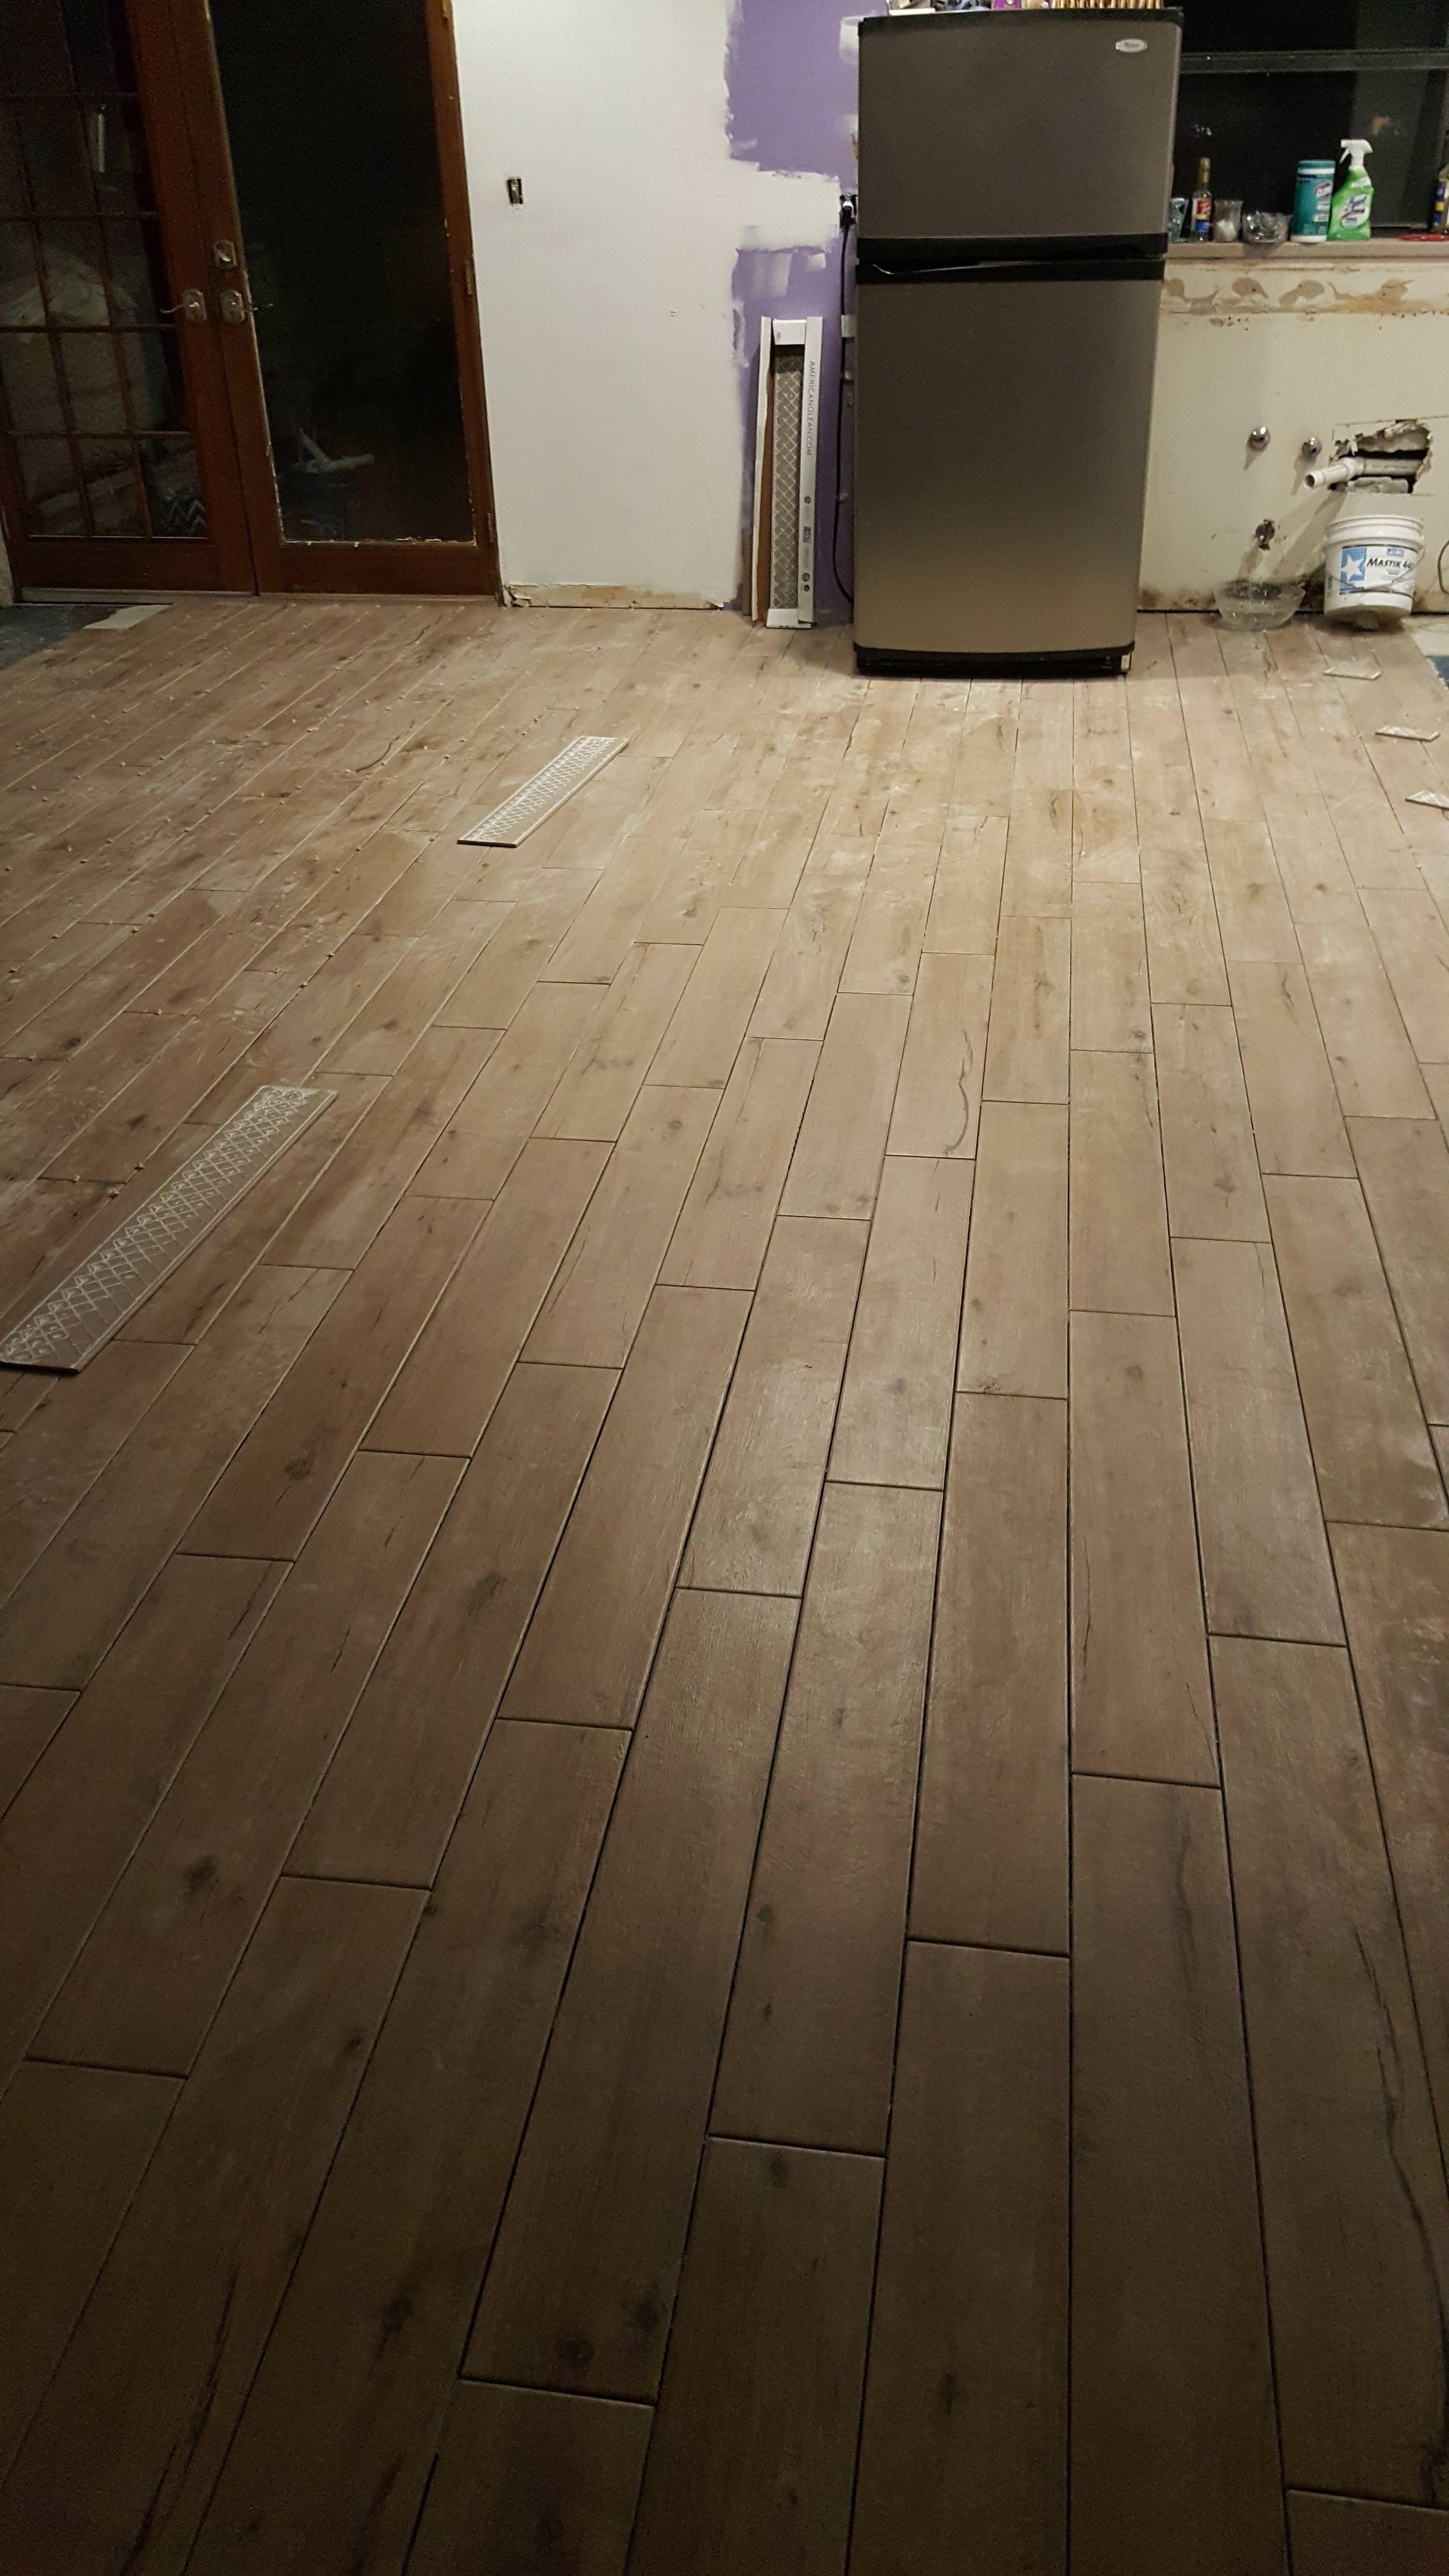 New Floors Flooring Porcelain Wood Tile Lowes Wood